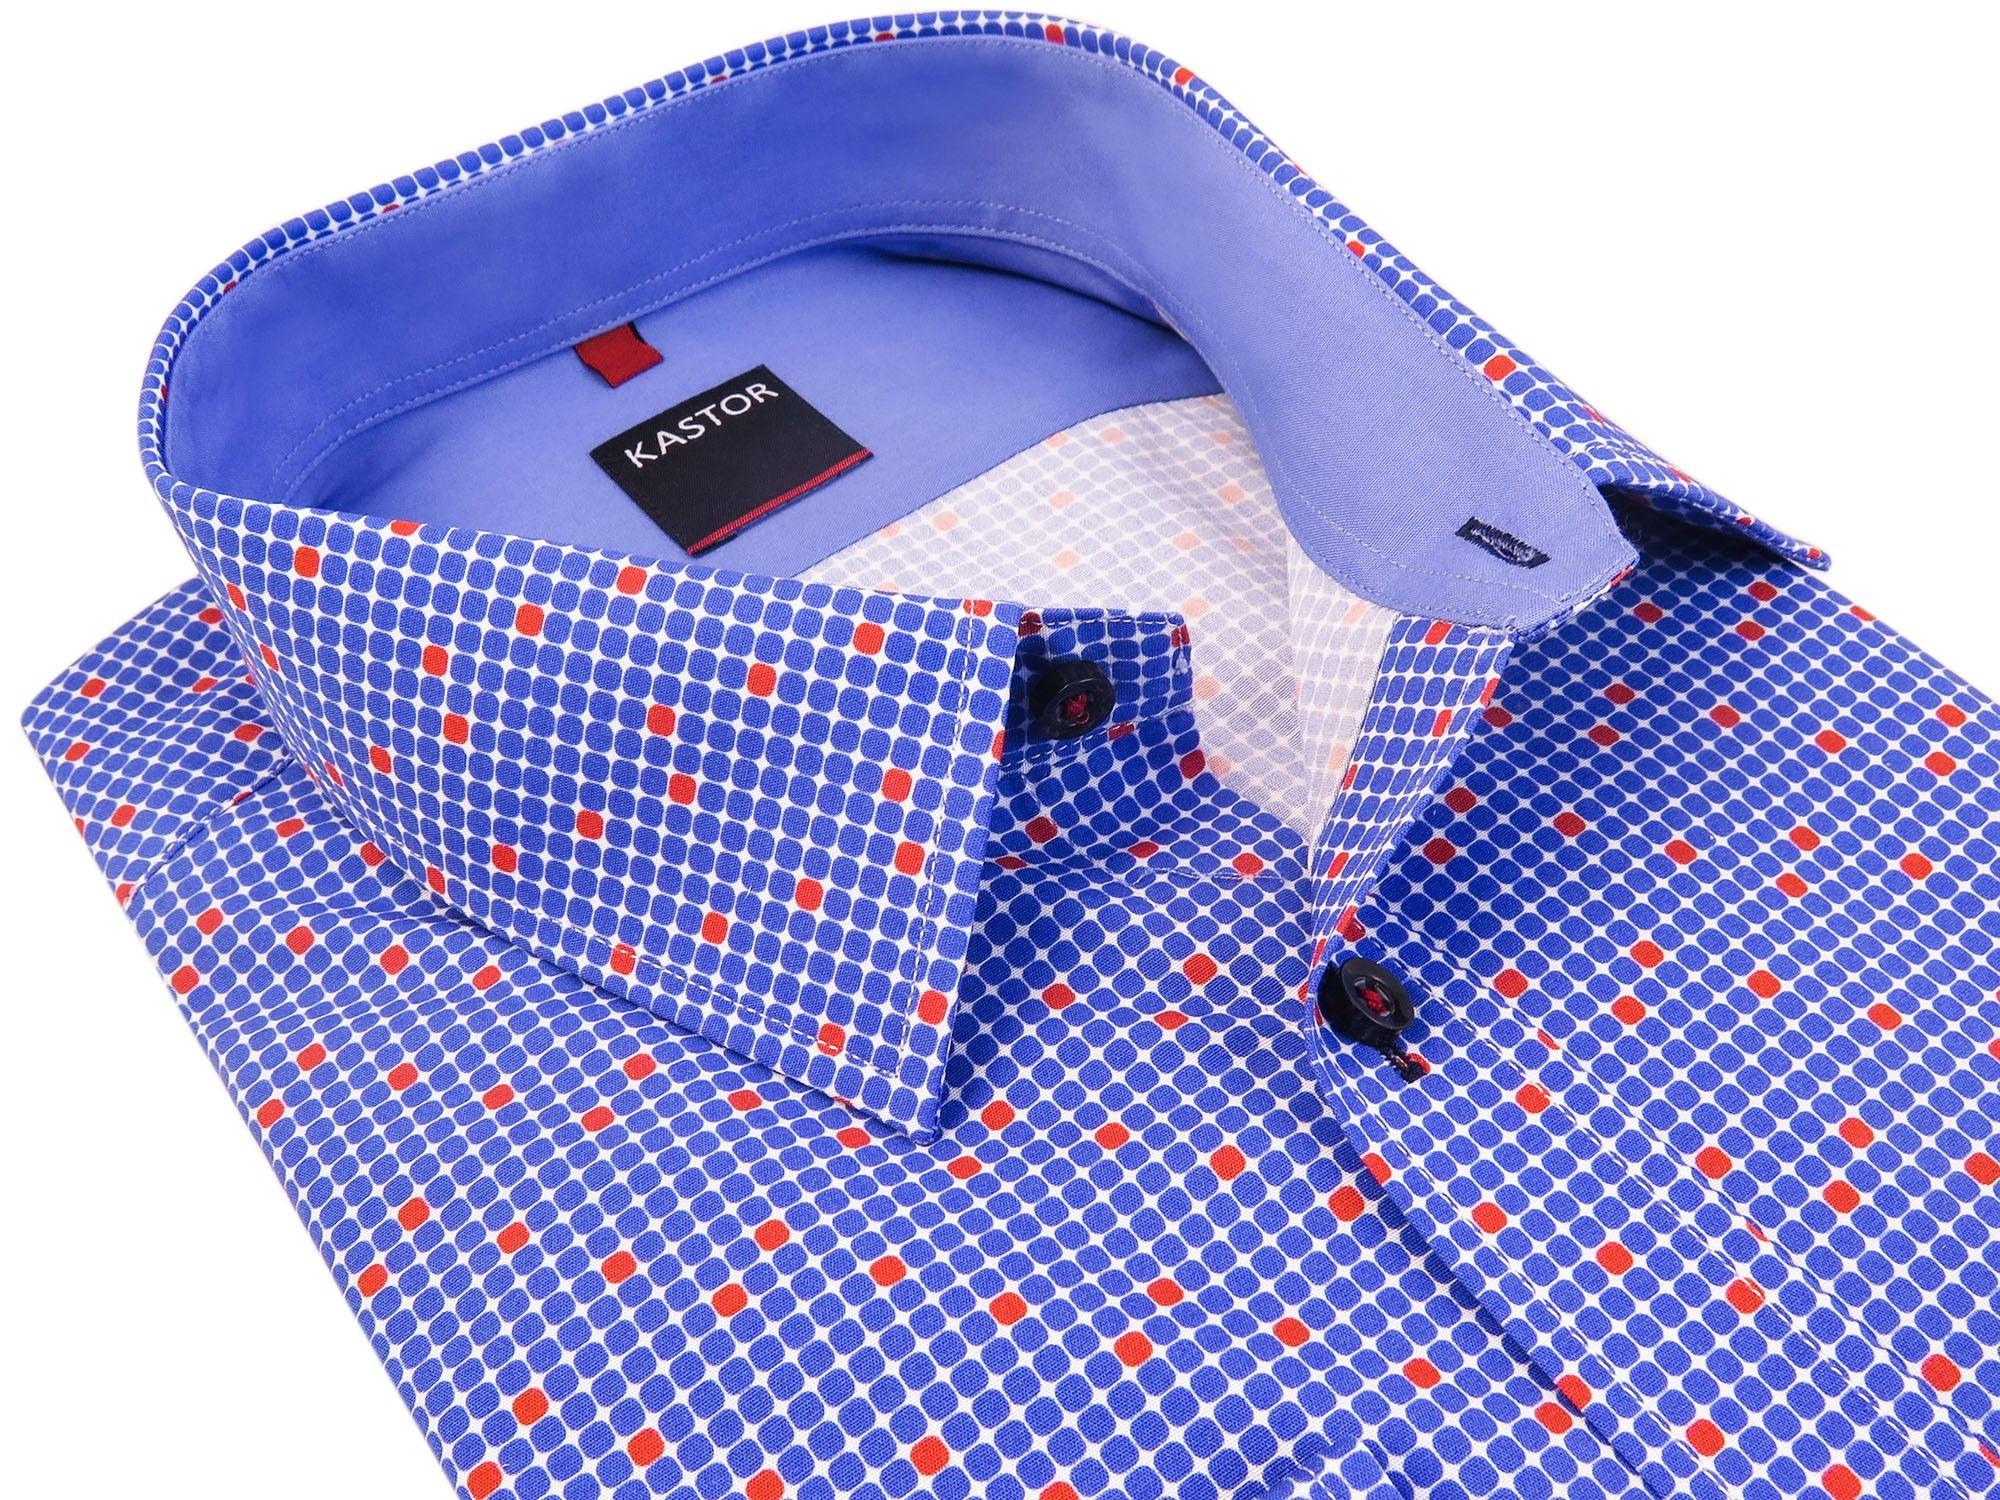 458de52ed Niebieska koszula męska KASTOR 176-182 44-SLIM K64 - 7340616179 ...